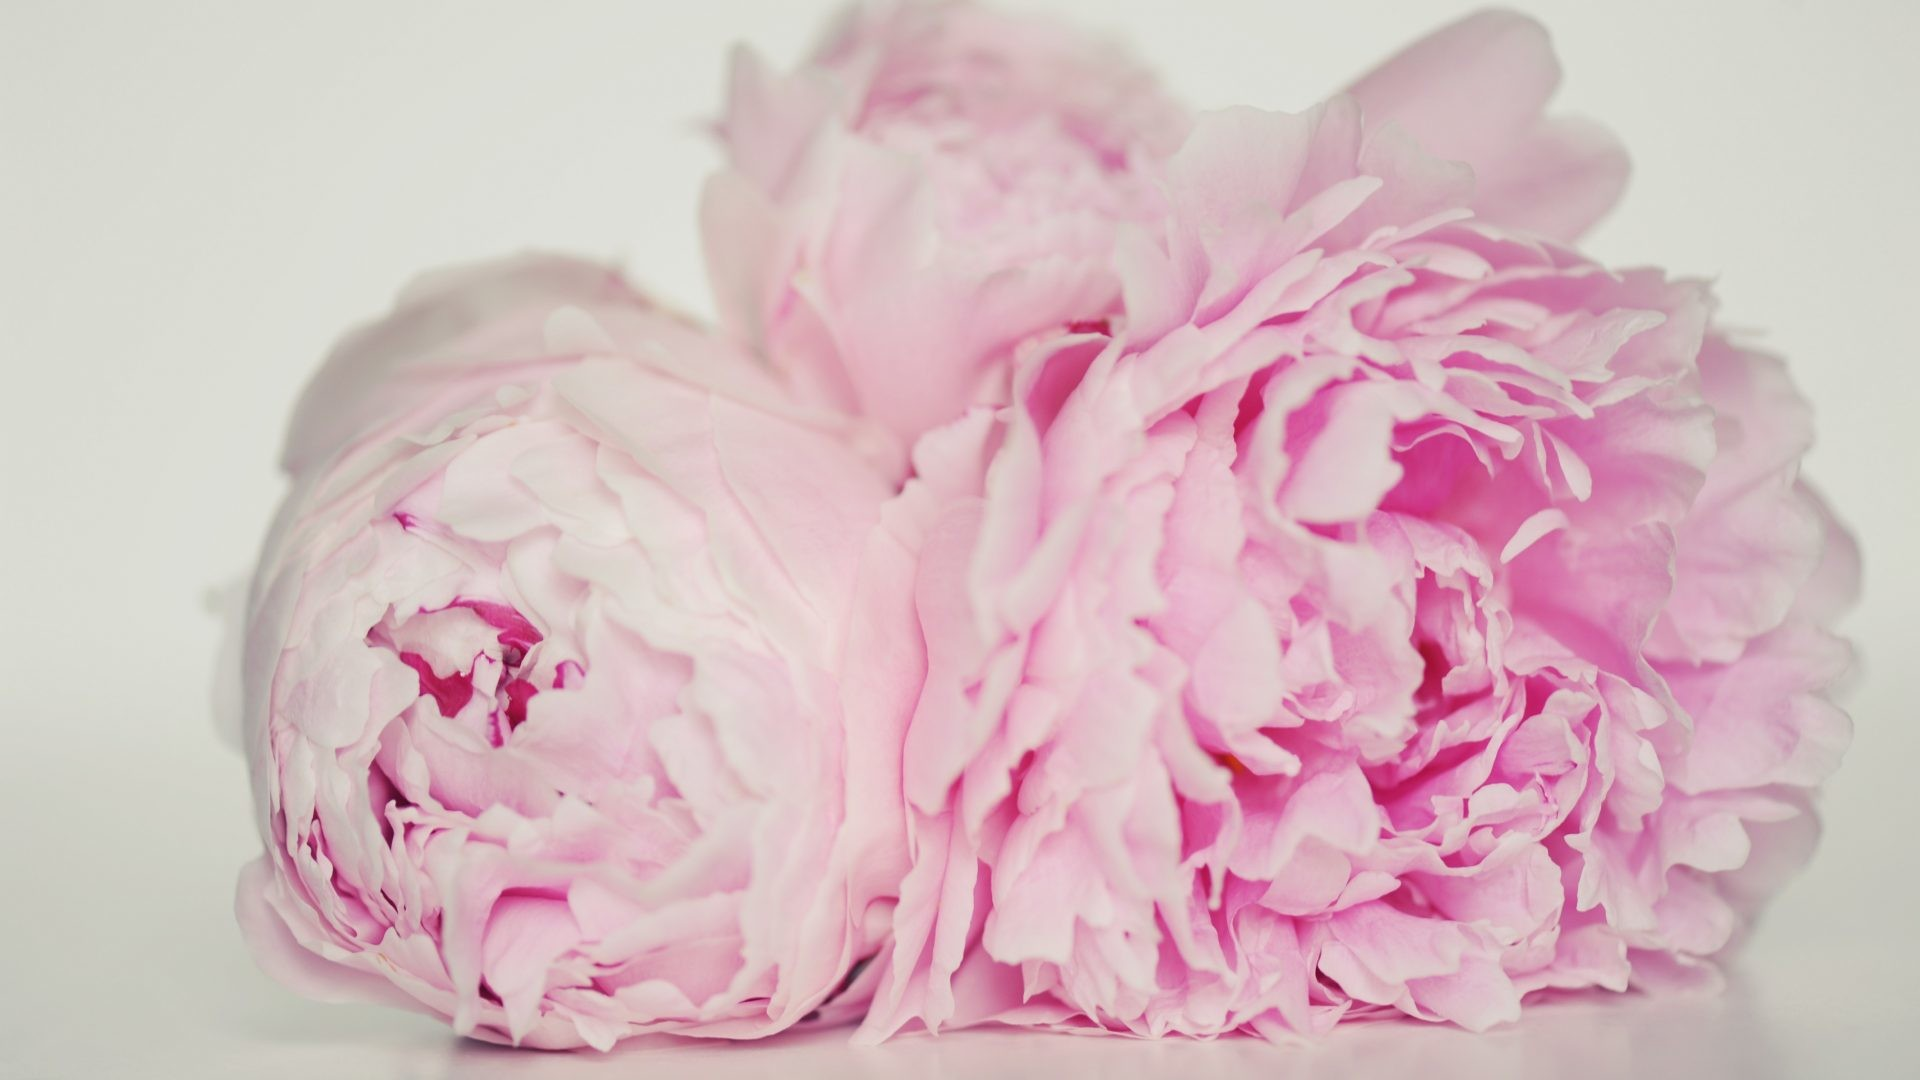 Flowers – Soul Elegance Flowers Forever Pink Peonies Nature Love Innocent  Pastel Graceful Heart Sweet Pretty